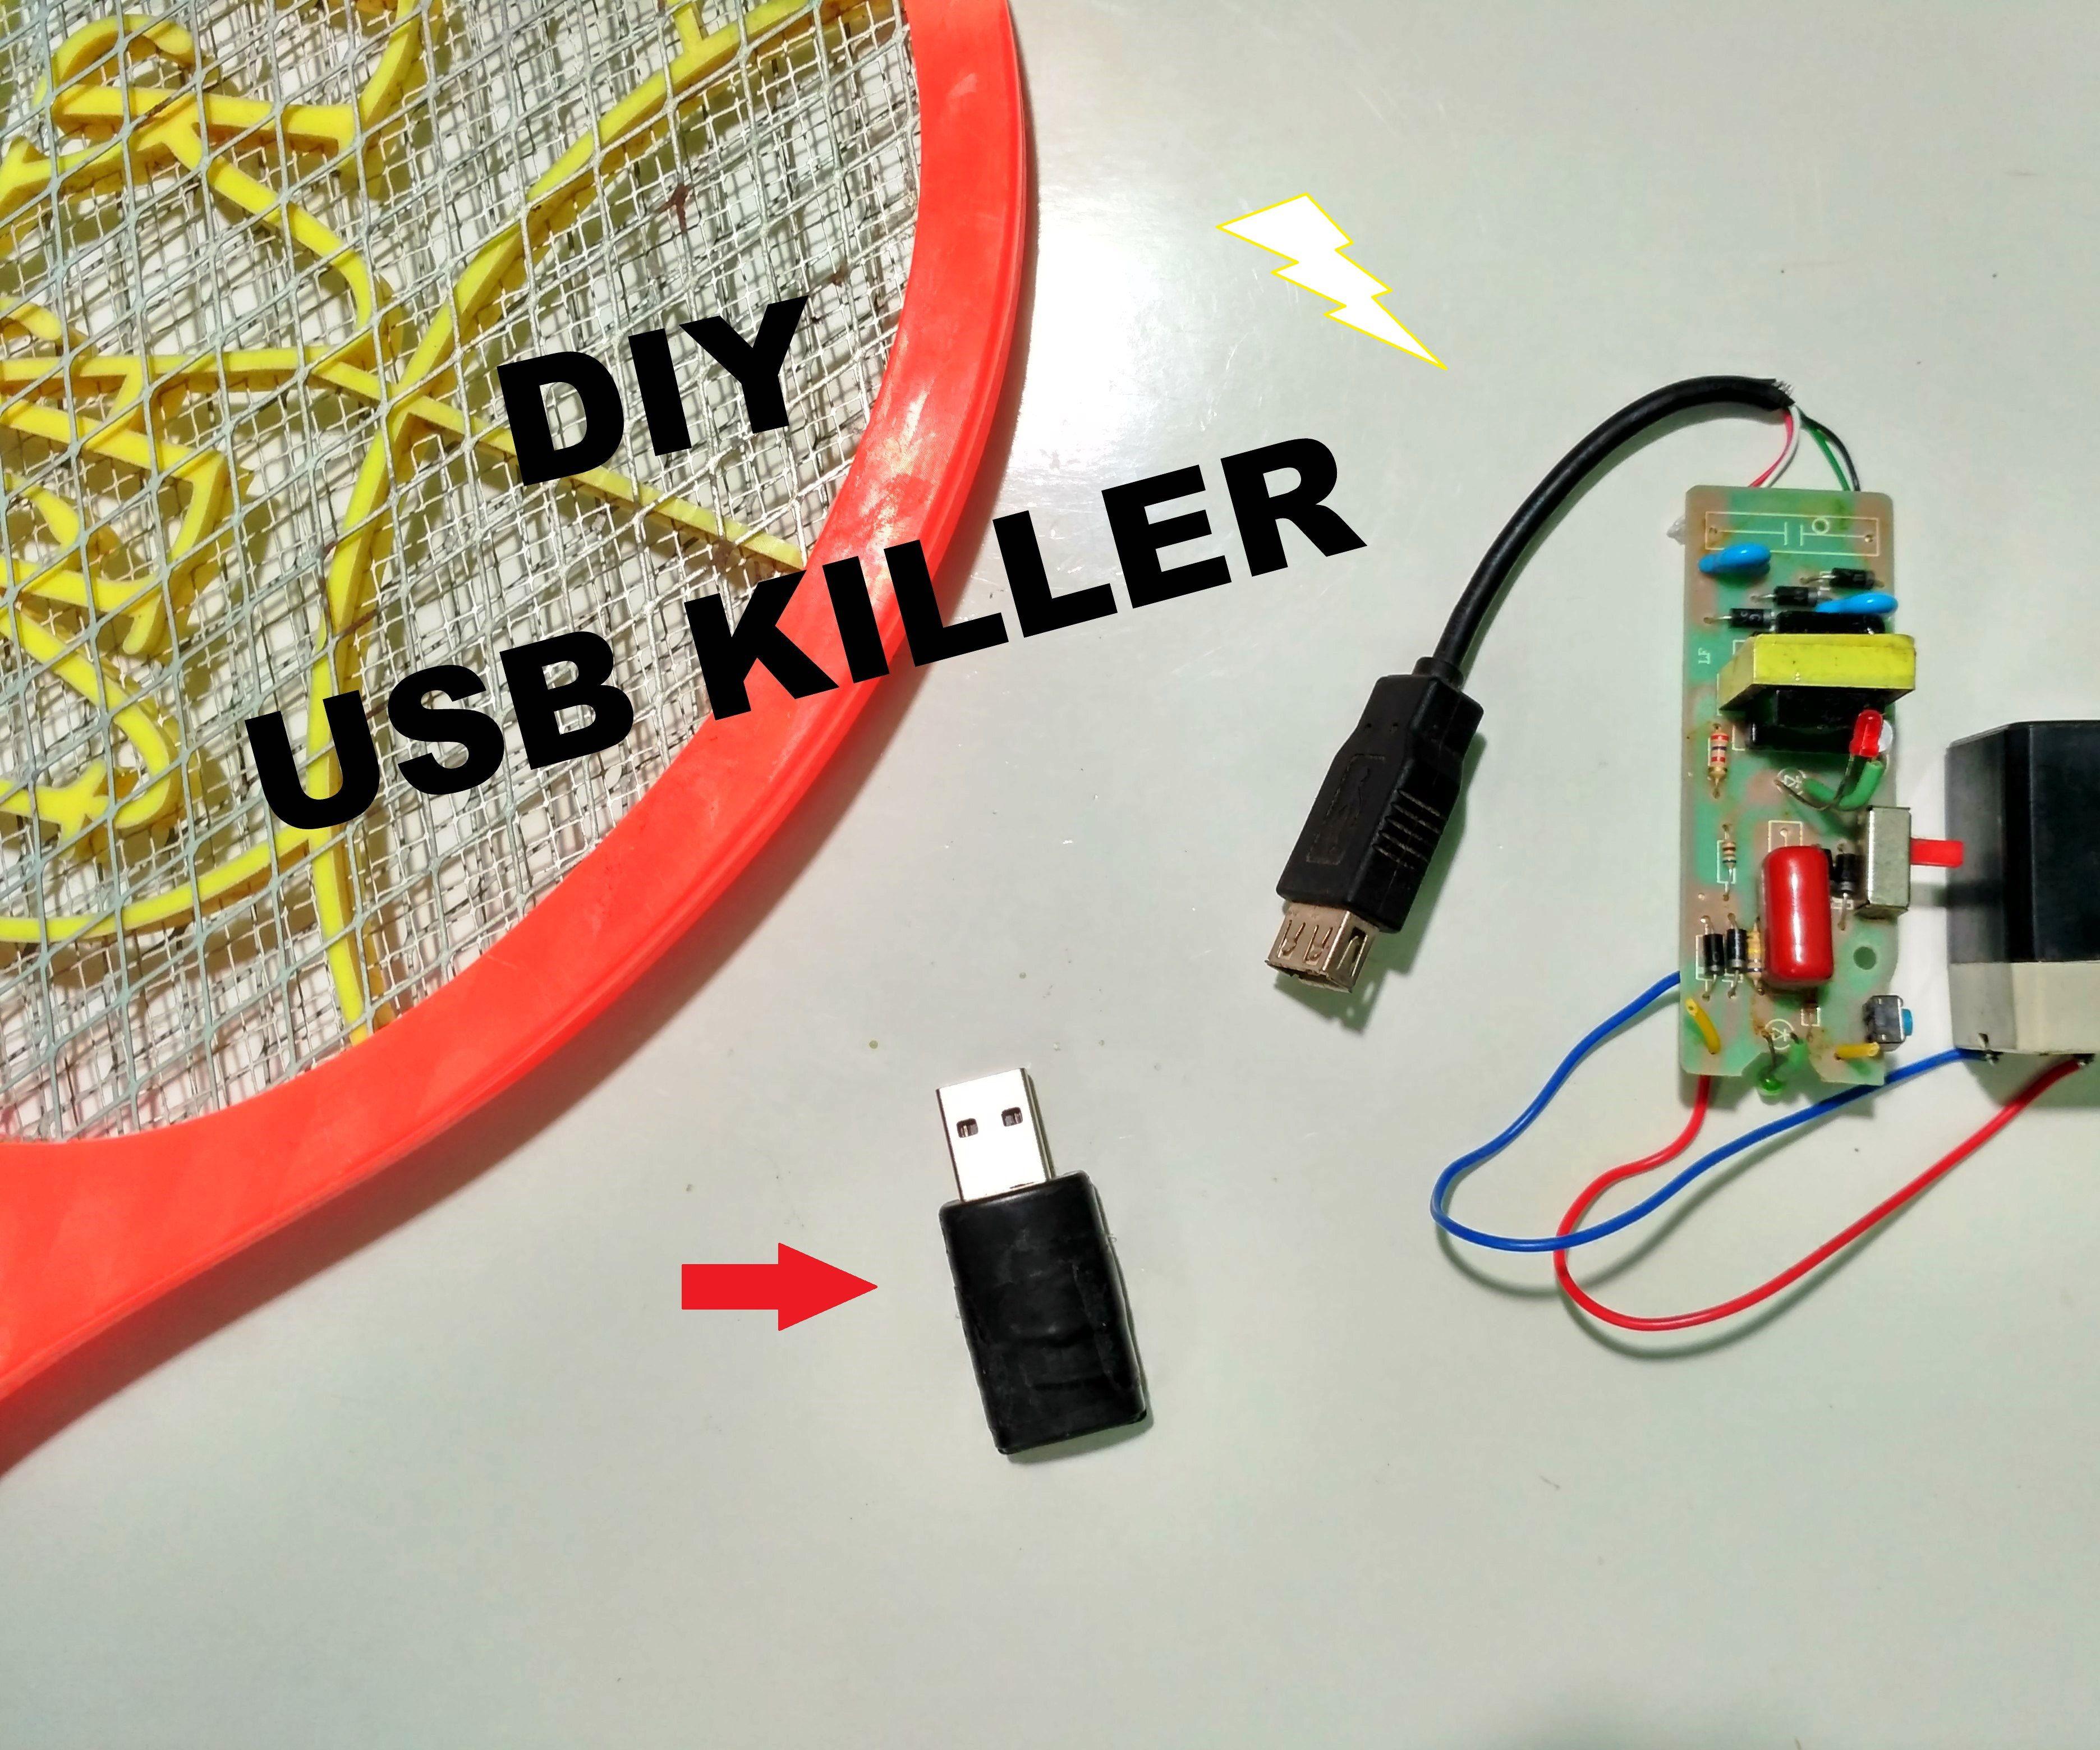 medium resolution of how to make an usb killer